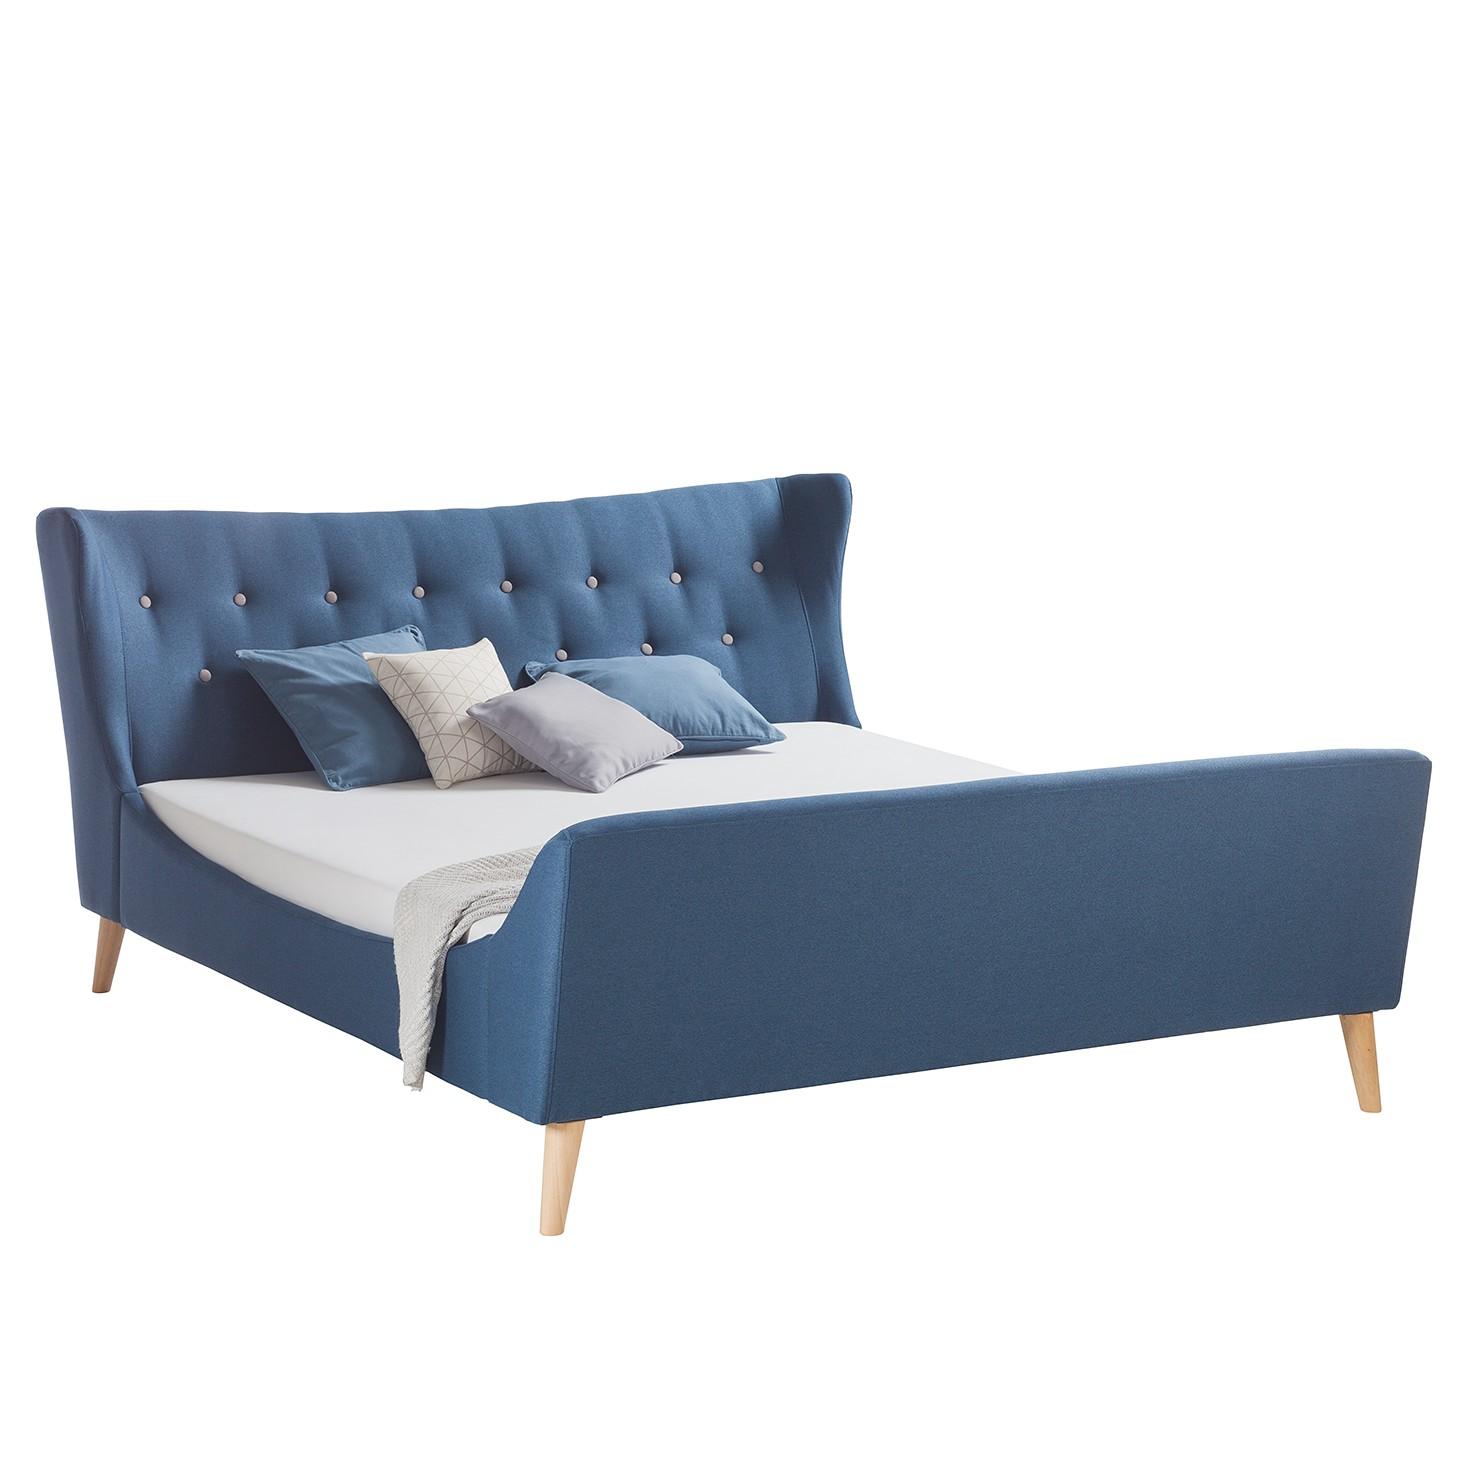 Lit capitonné Kamma - Tissu - 140 x 200cm - Bleu foncé, Morteens